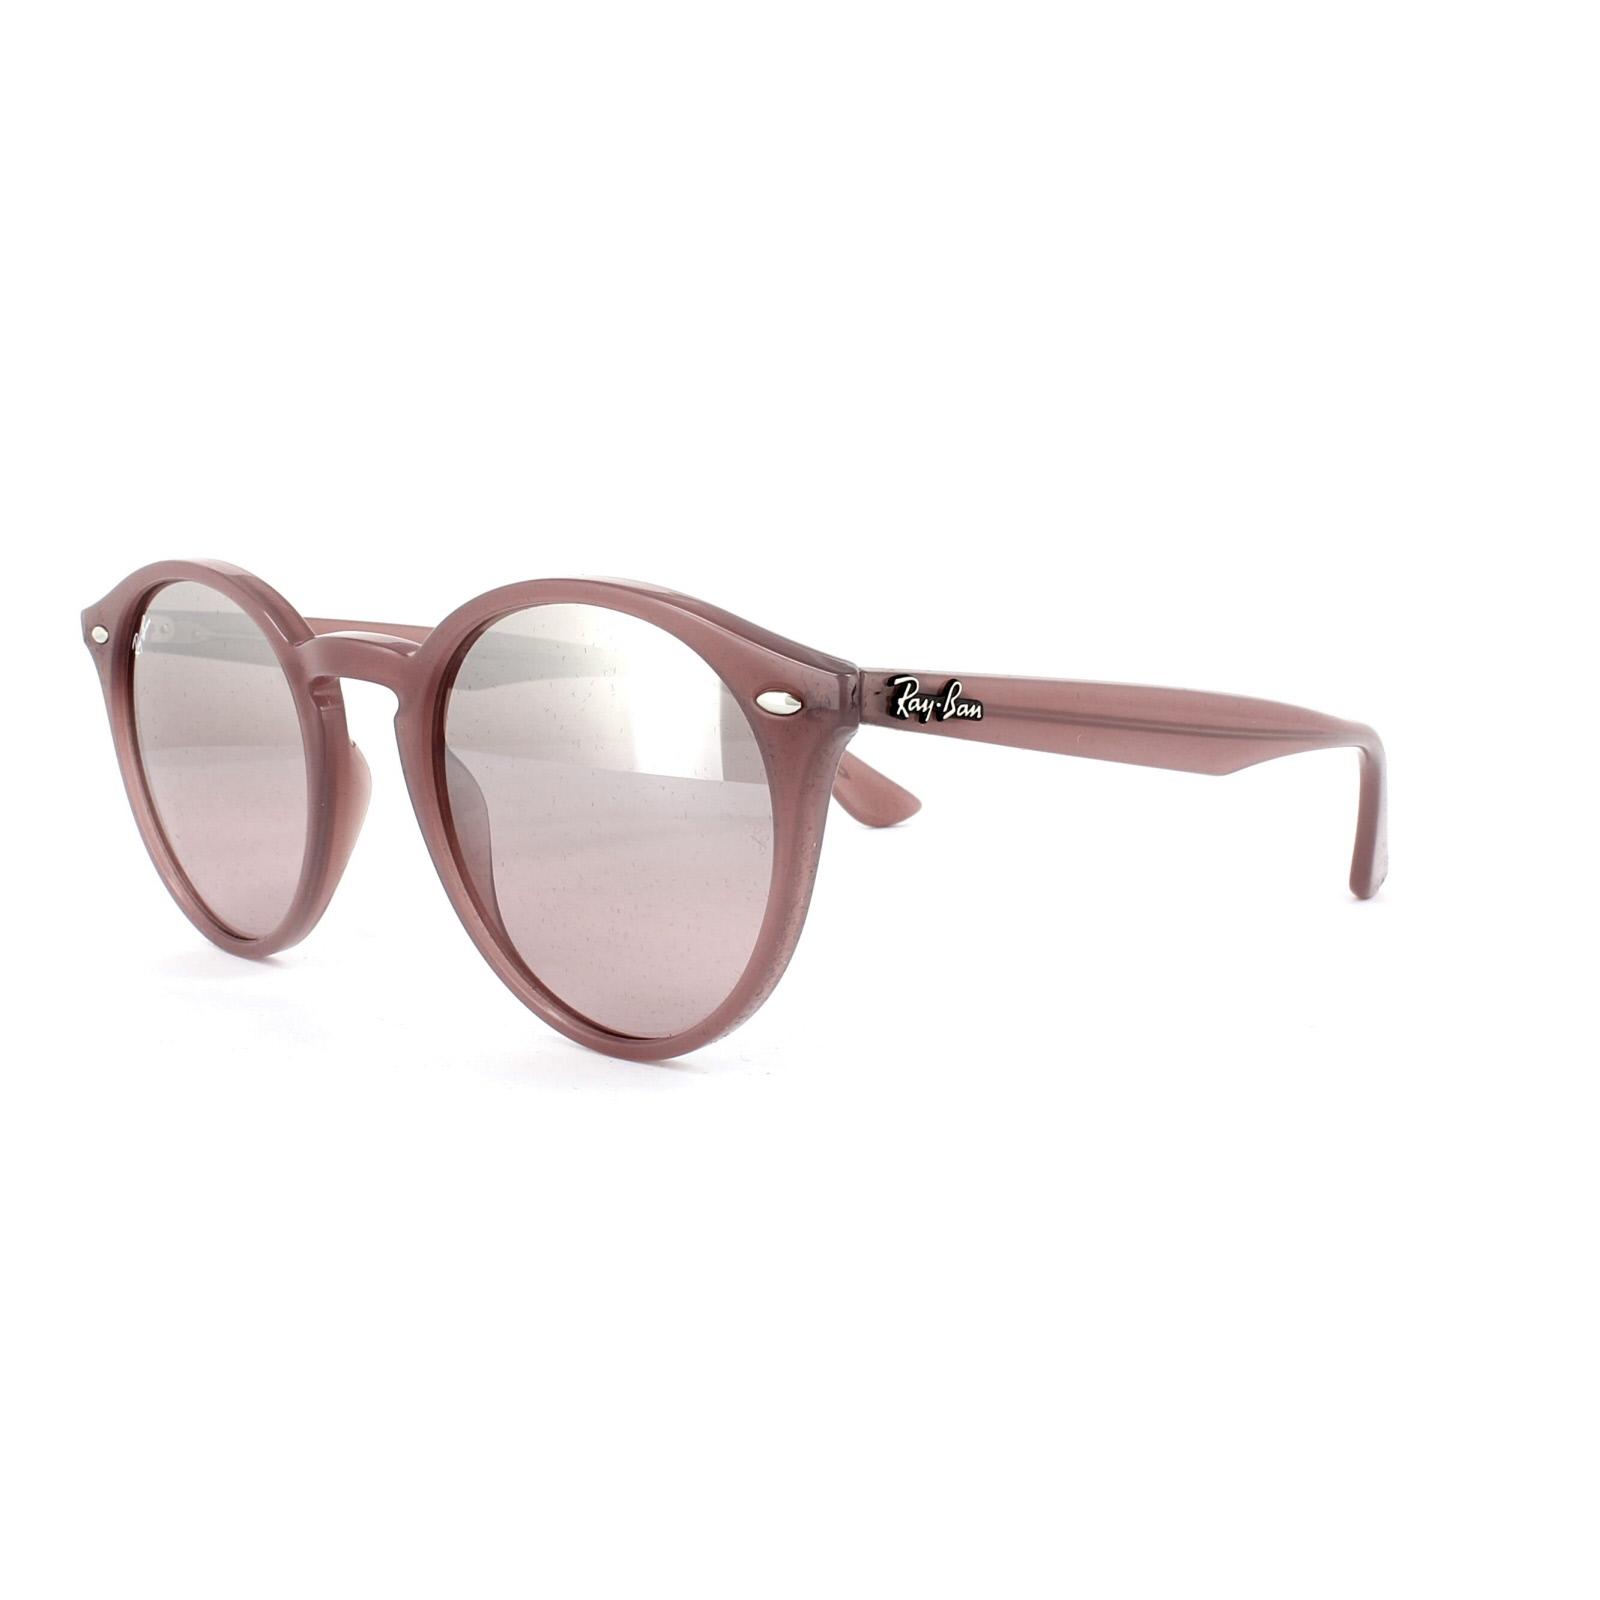 e1dc2c3aae6 Sentinel Ray-Ban Sunglasses 2180 62297E Pink Silver Pink Gradient Mirror